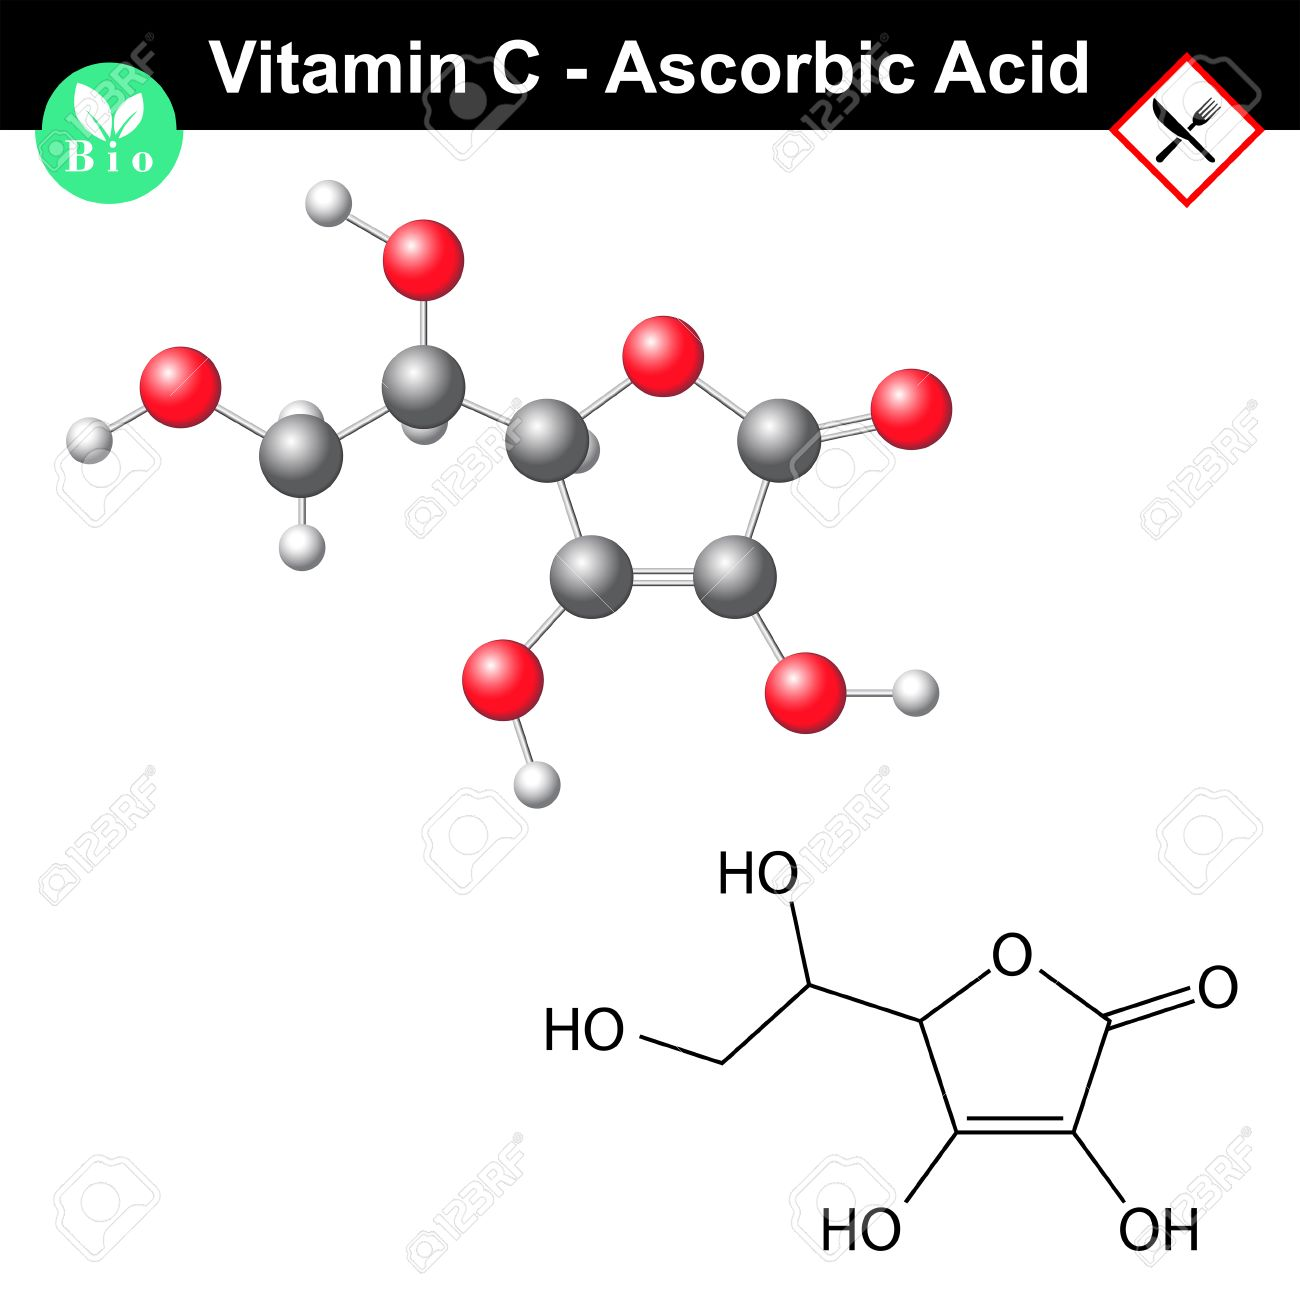 Ascorbic acid ascorbate molecule structural chemical formula ascorbic acid ascorbate molecule structural chemical formula and model vitamin c e300 buycottarizona